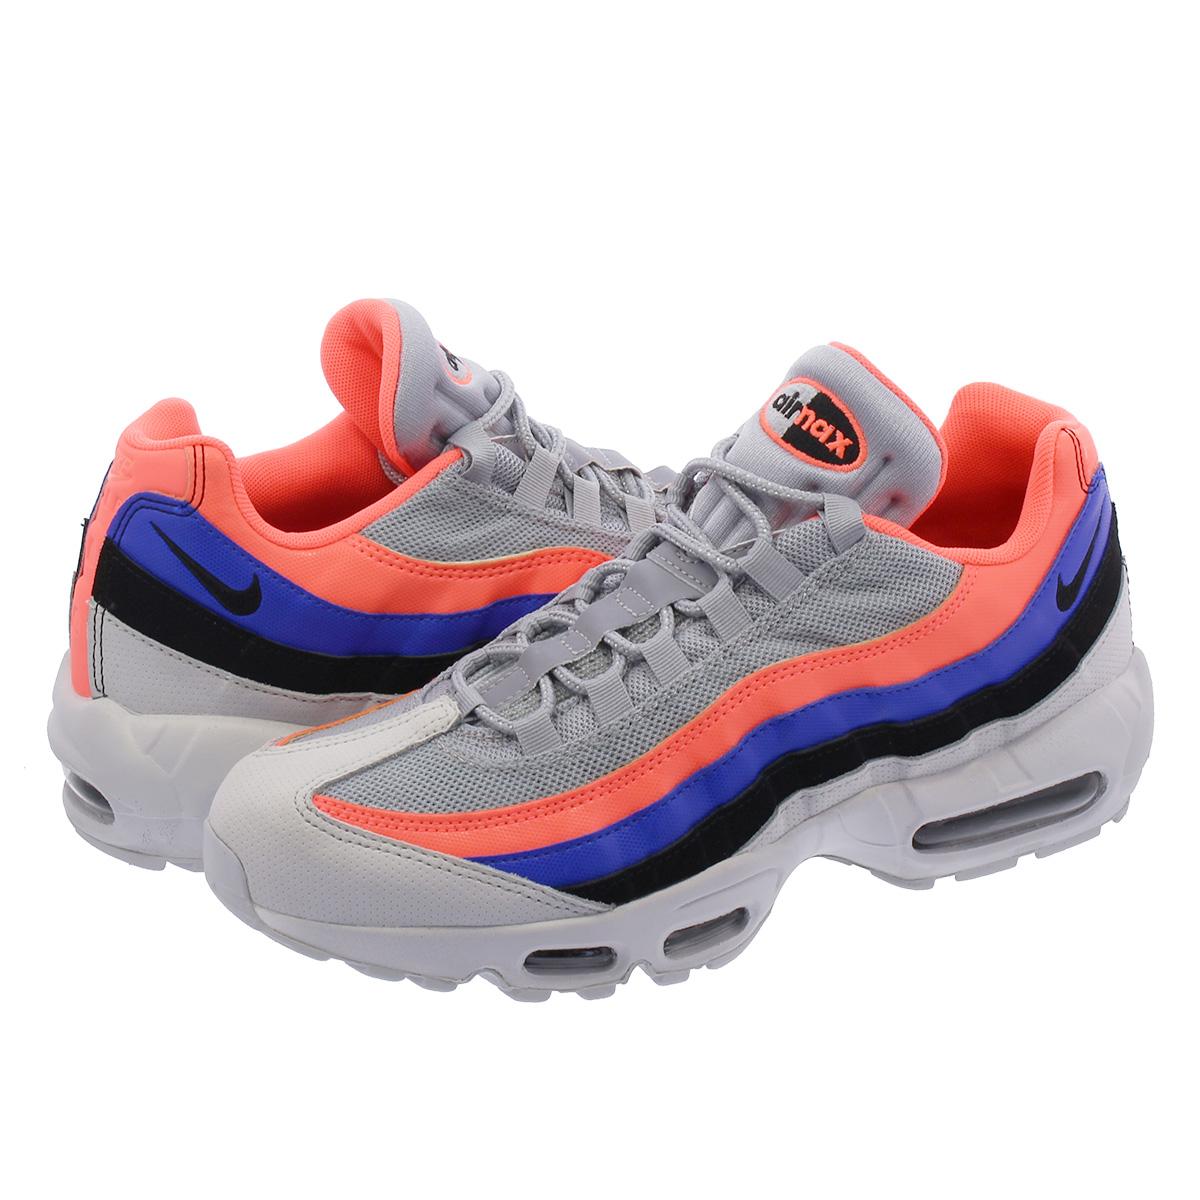 separation shoes 547a5 c9658 ... australia nike air max 95 essential kie ney amax 95 essential pure  platinum black bright mango